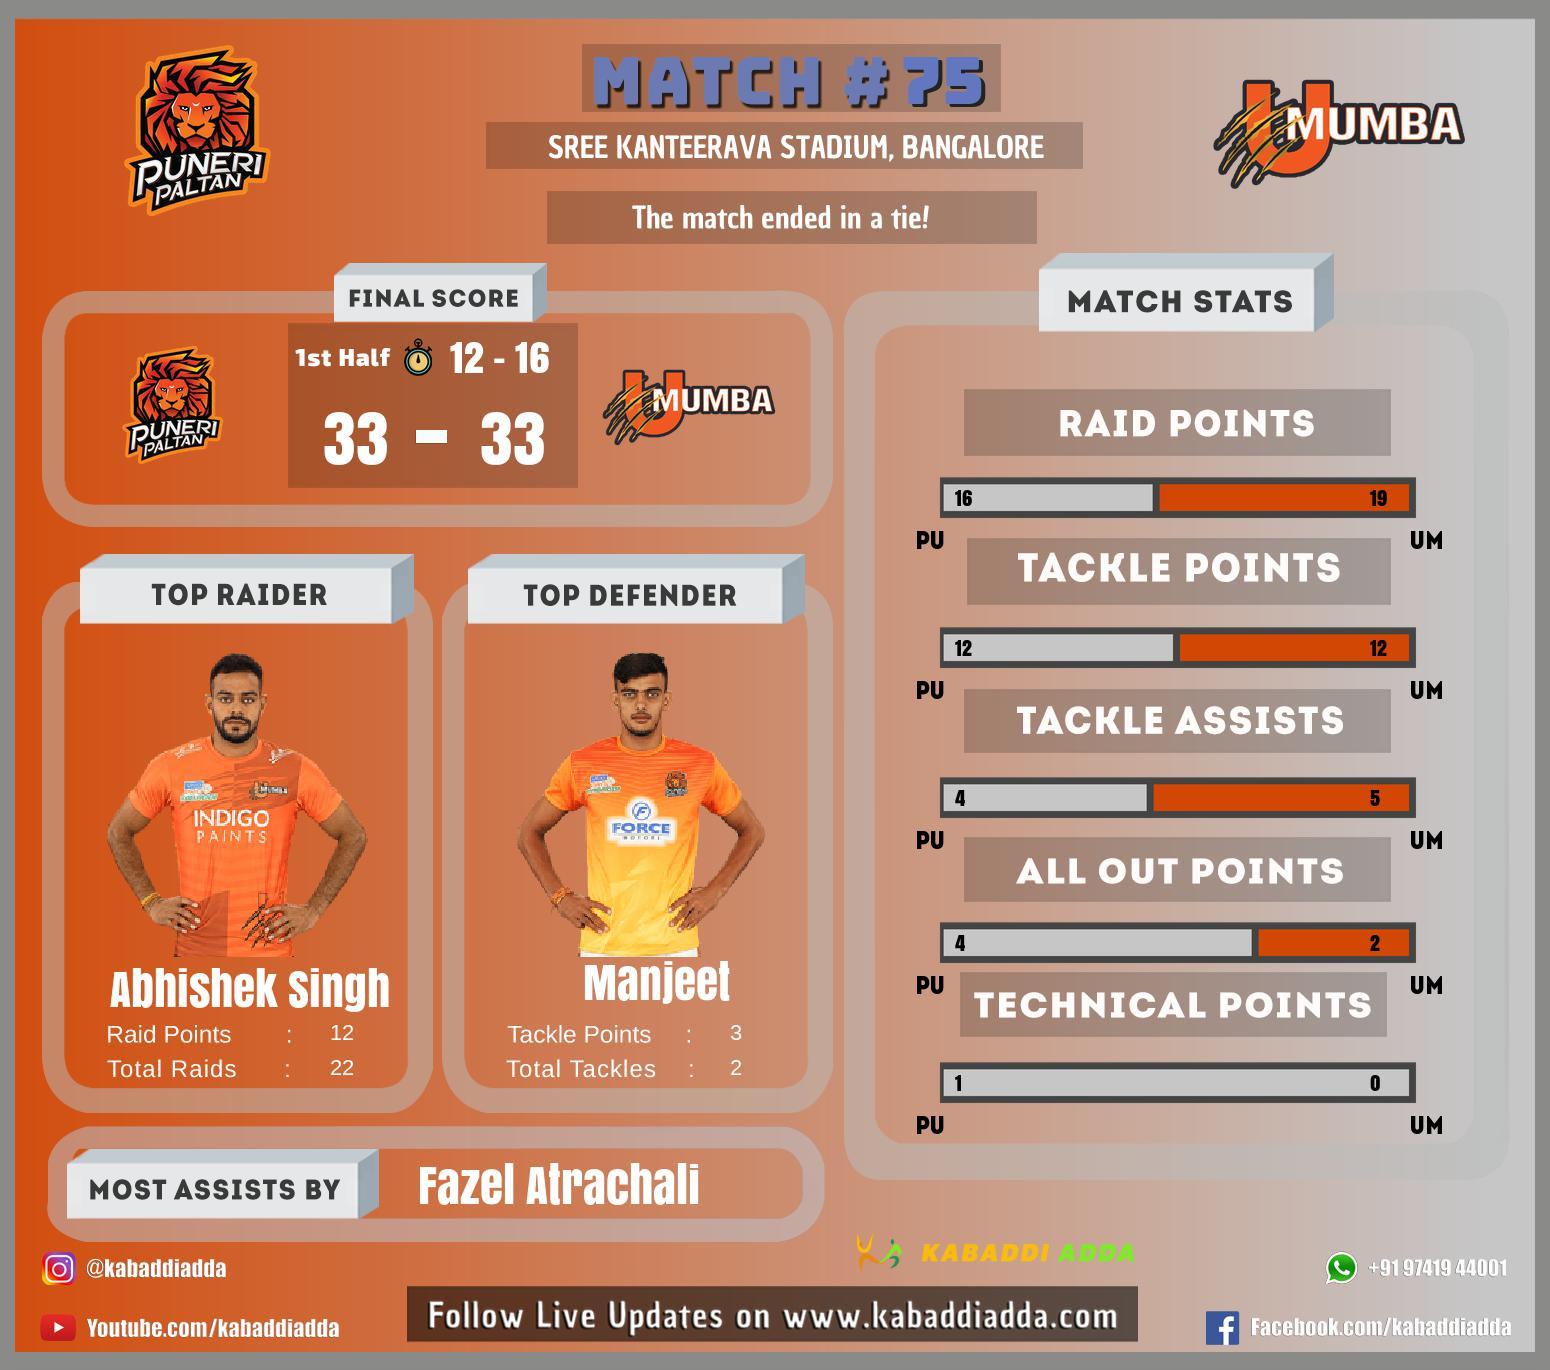 Puneri Paltan is playing against U Mumba